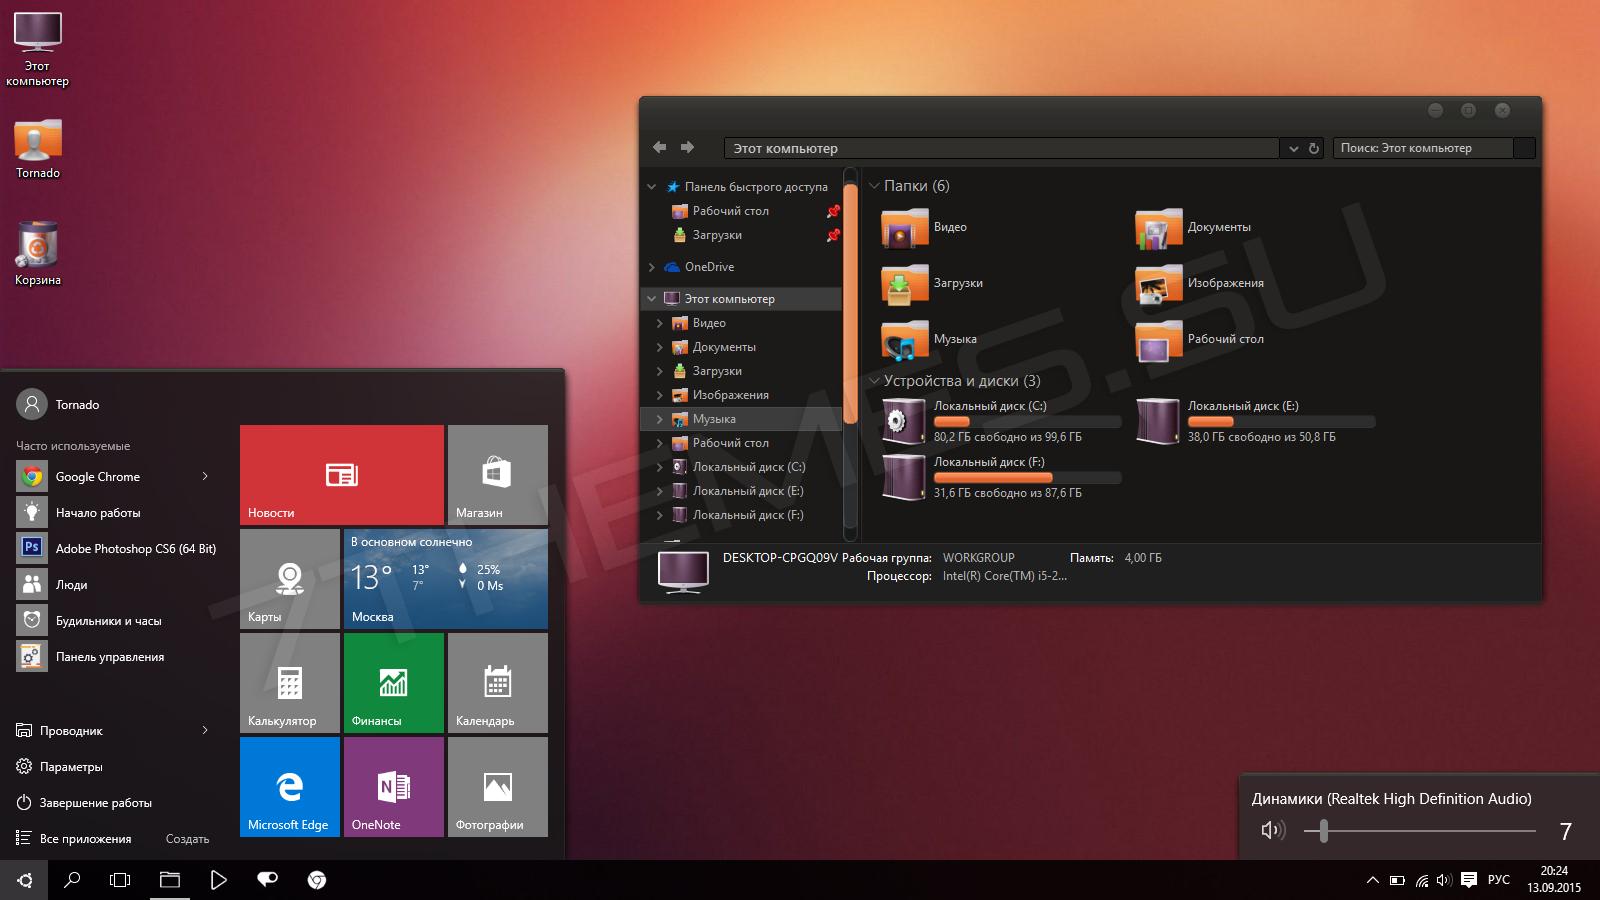 Ubuntu Dark Light theme windows 10 | 7 Themeus - Costumize Your Windows!